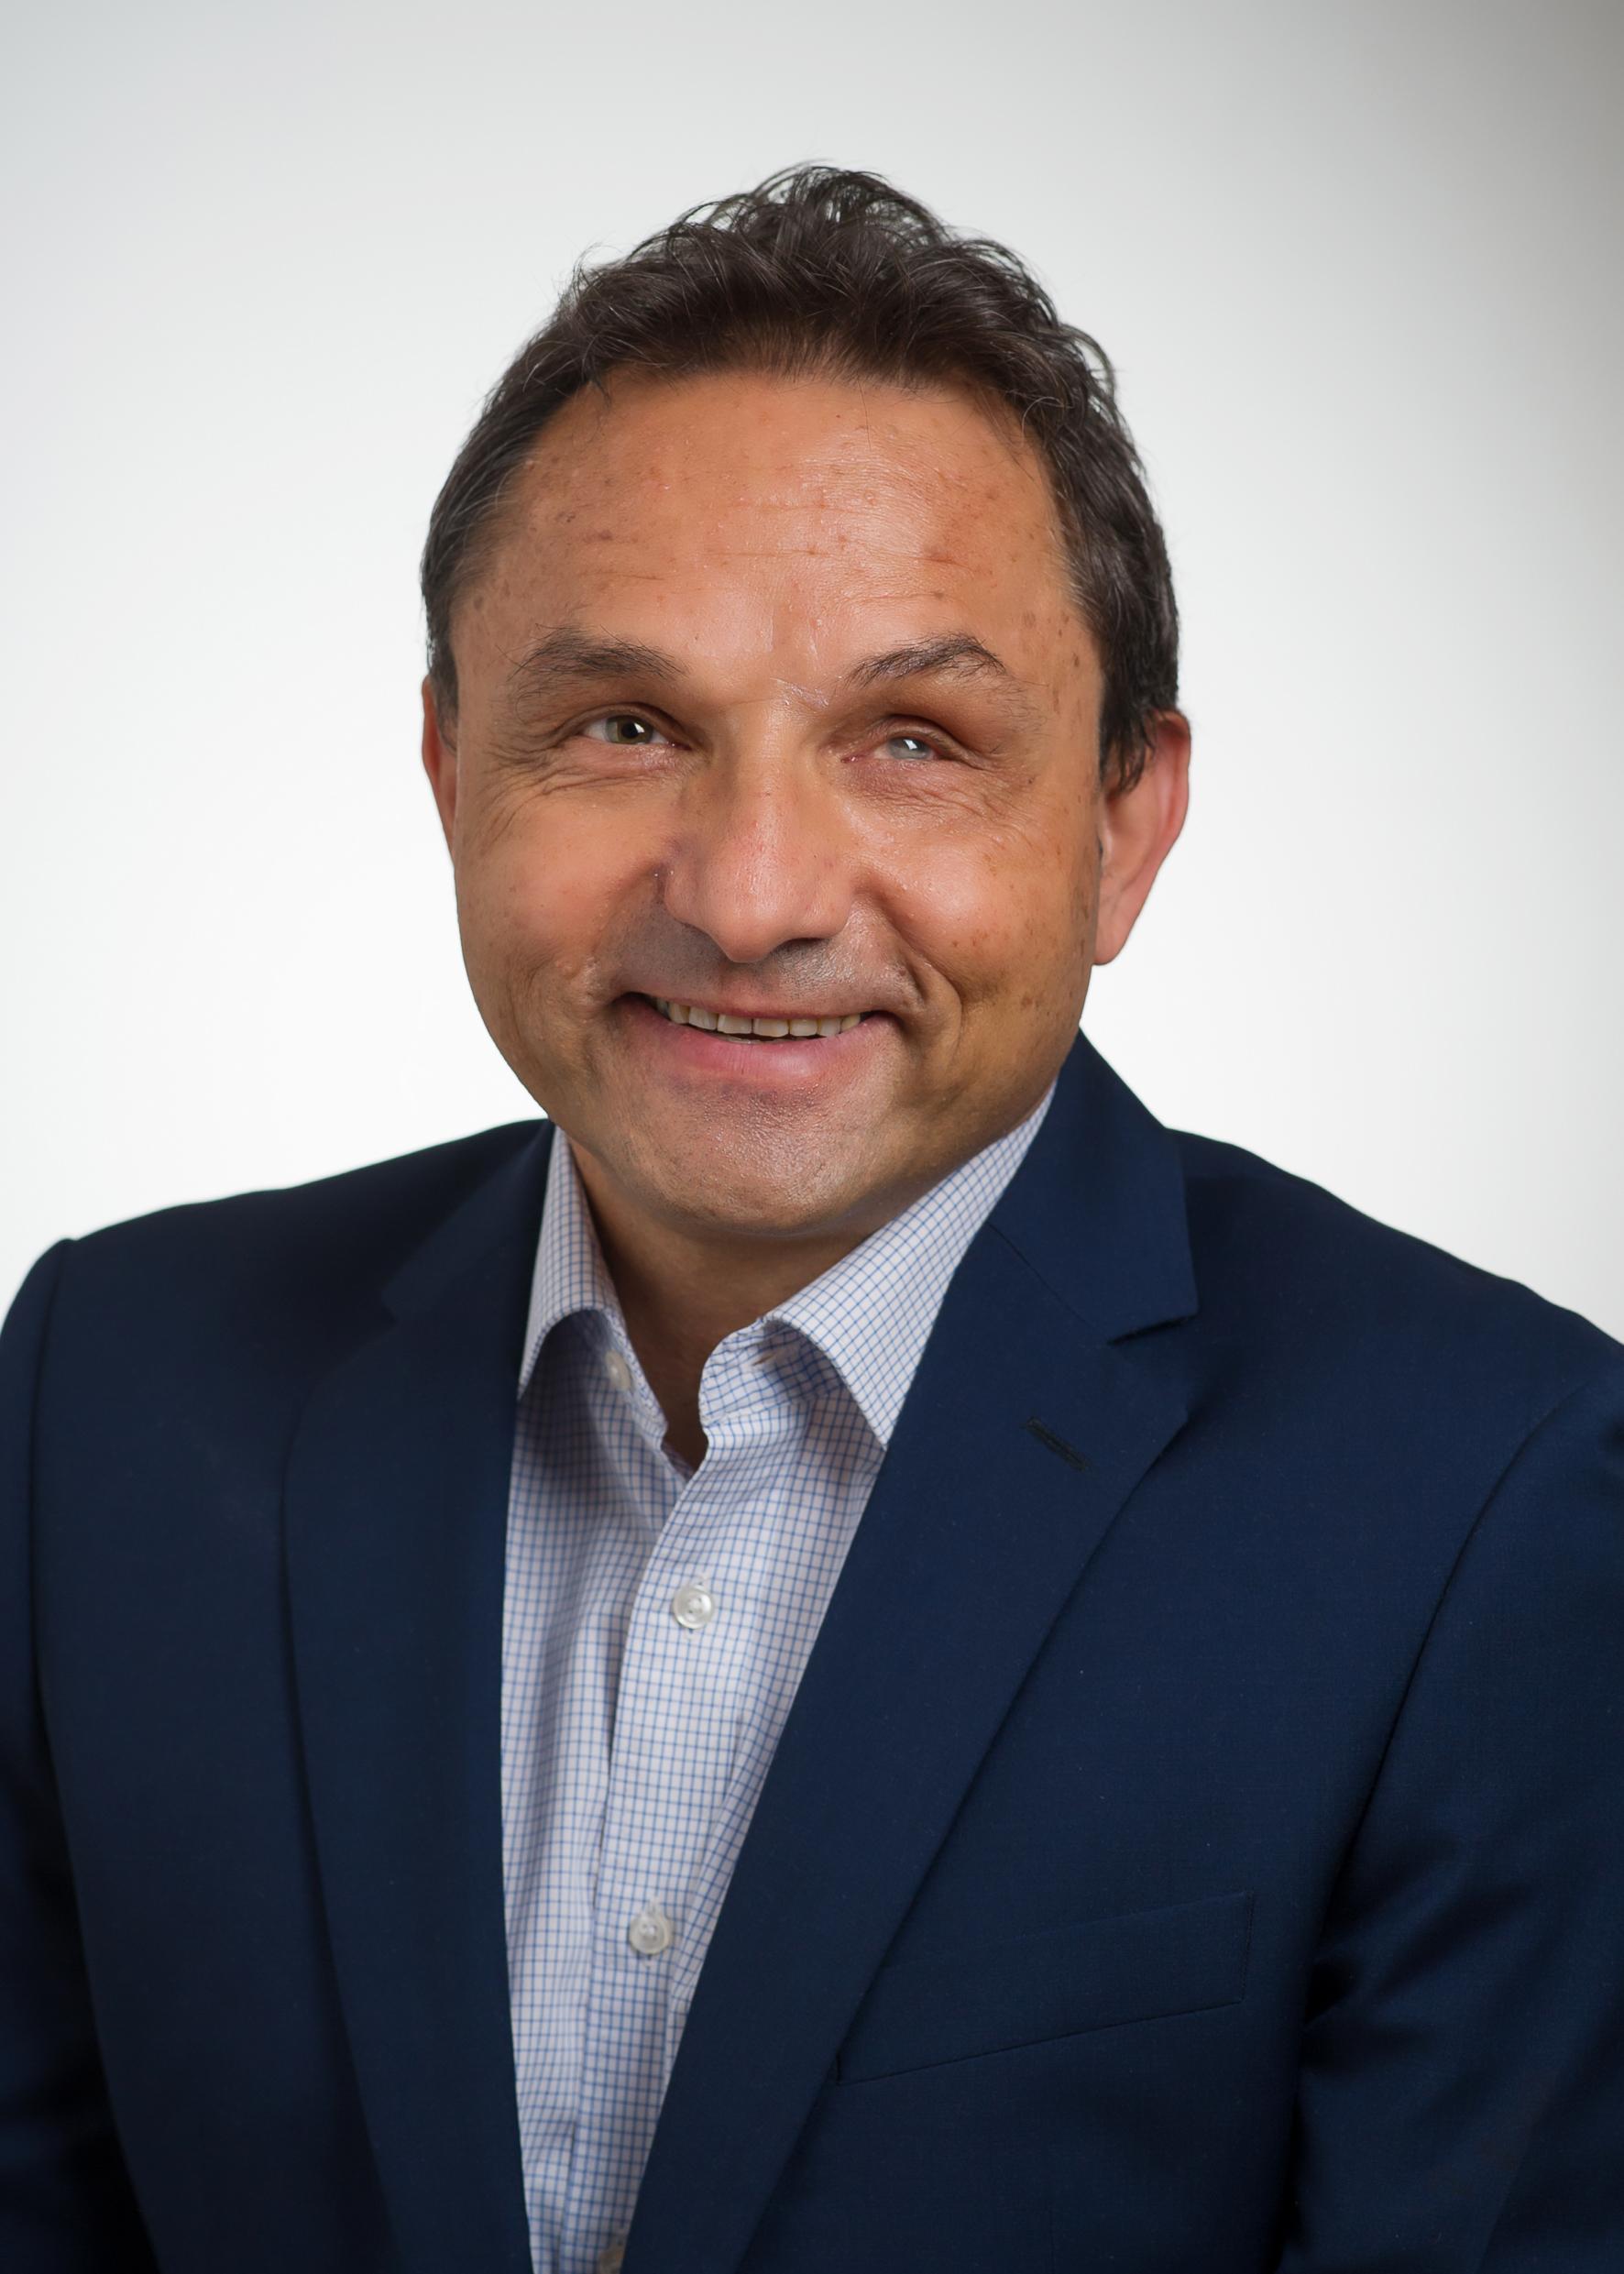 Mag. Dr. Alexander Niederwimmer